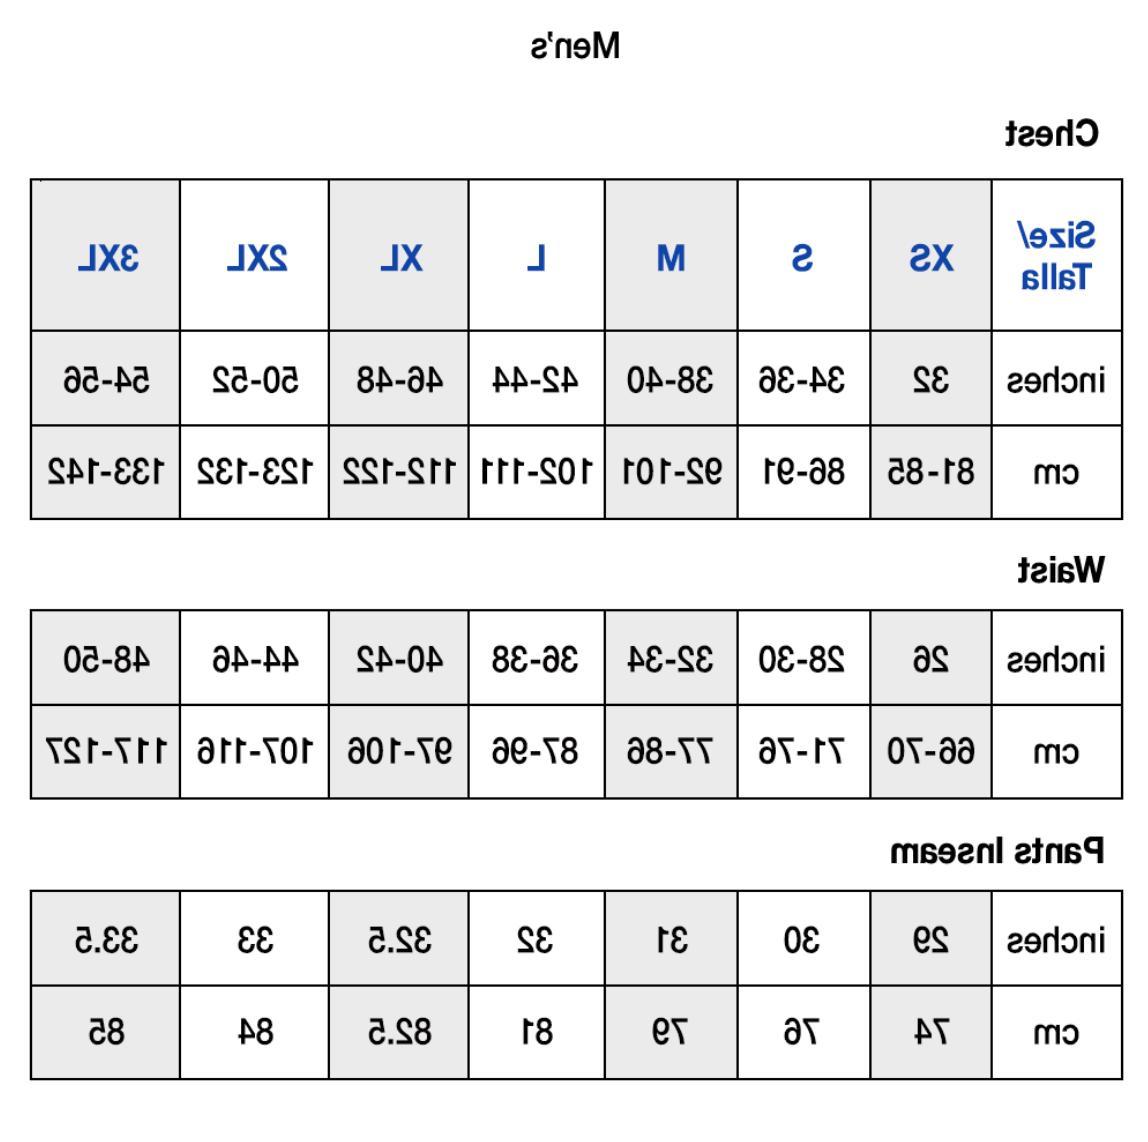 Champion Long Mesh Short Pockets - 81622